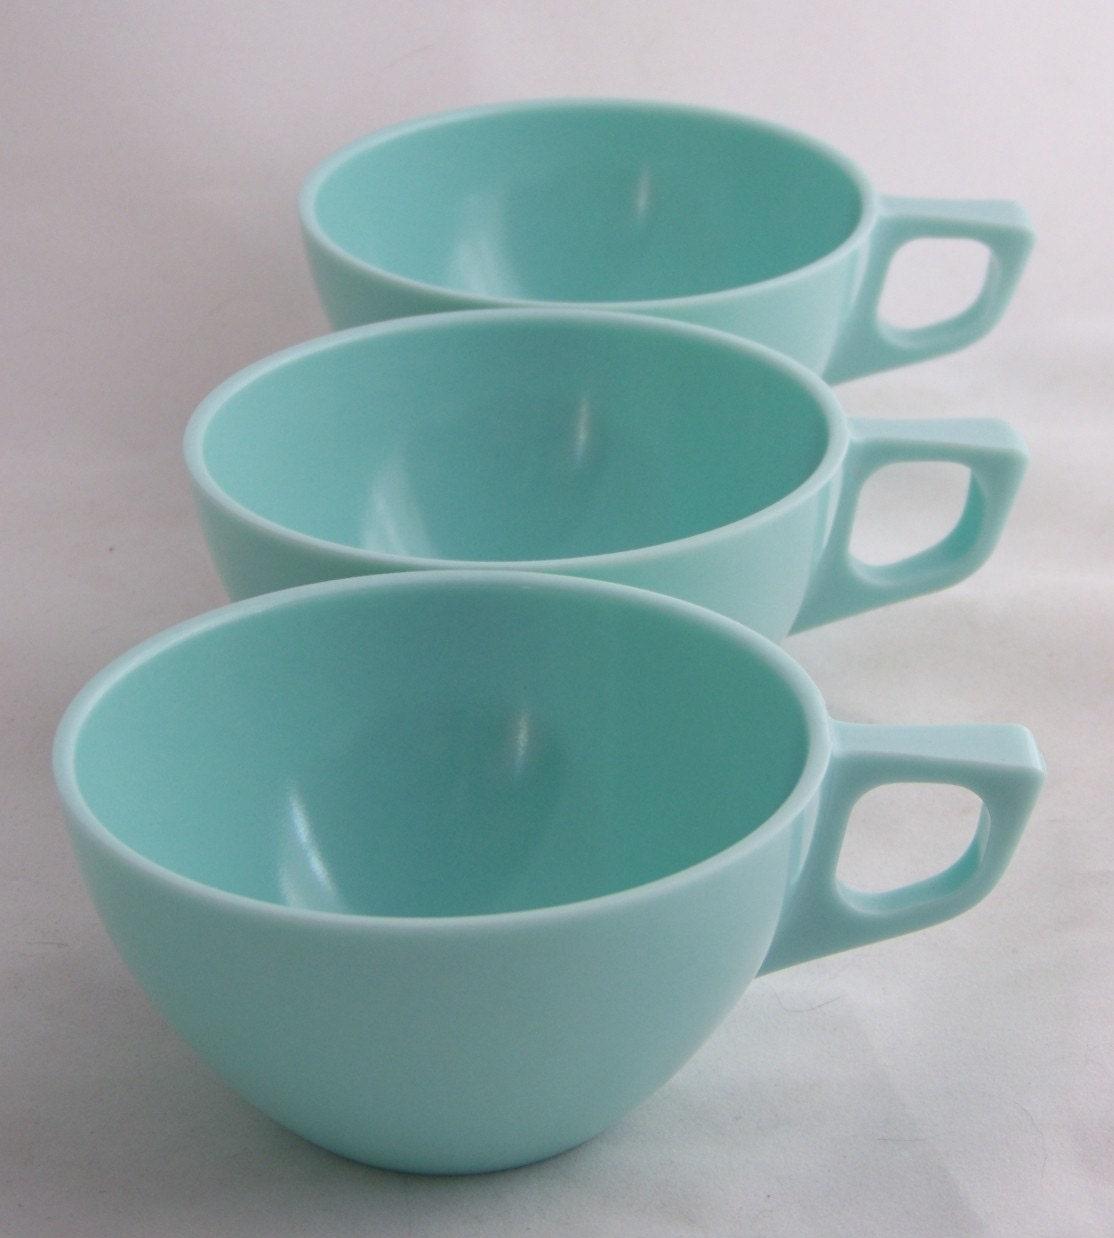 Set of Three Vintage Modern Aqua Blue Melmac Tea or Coffee Cups